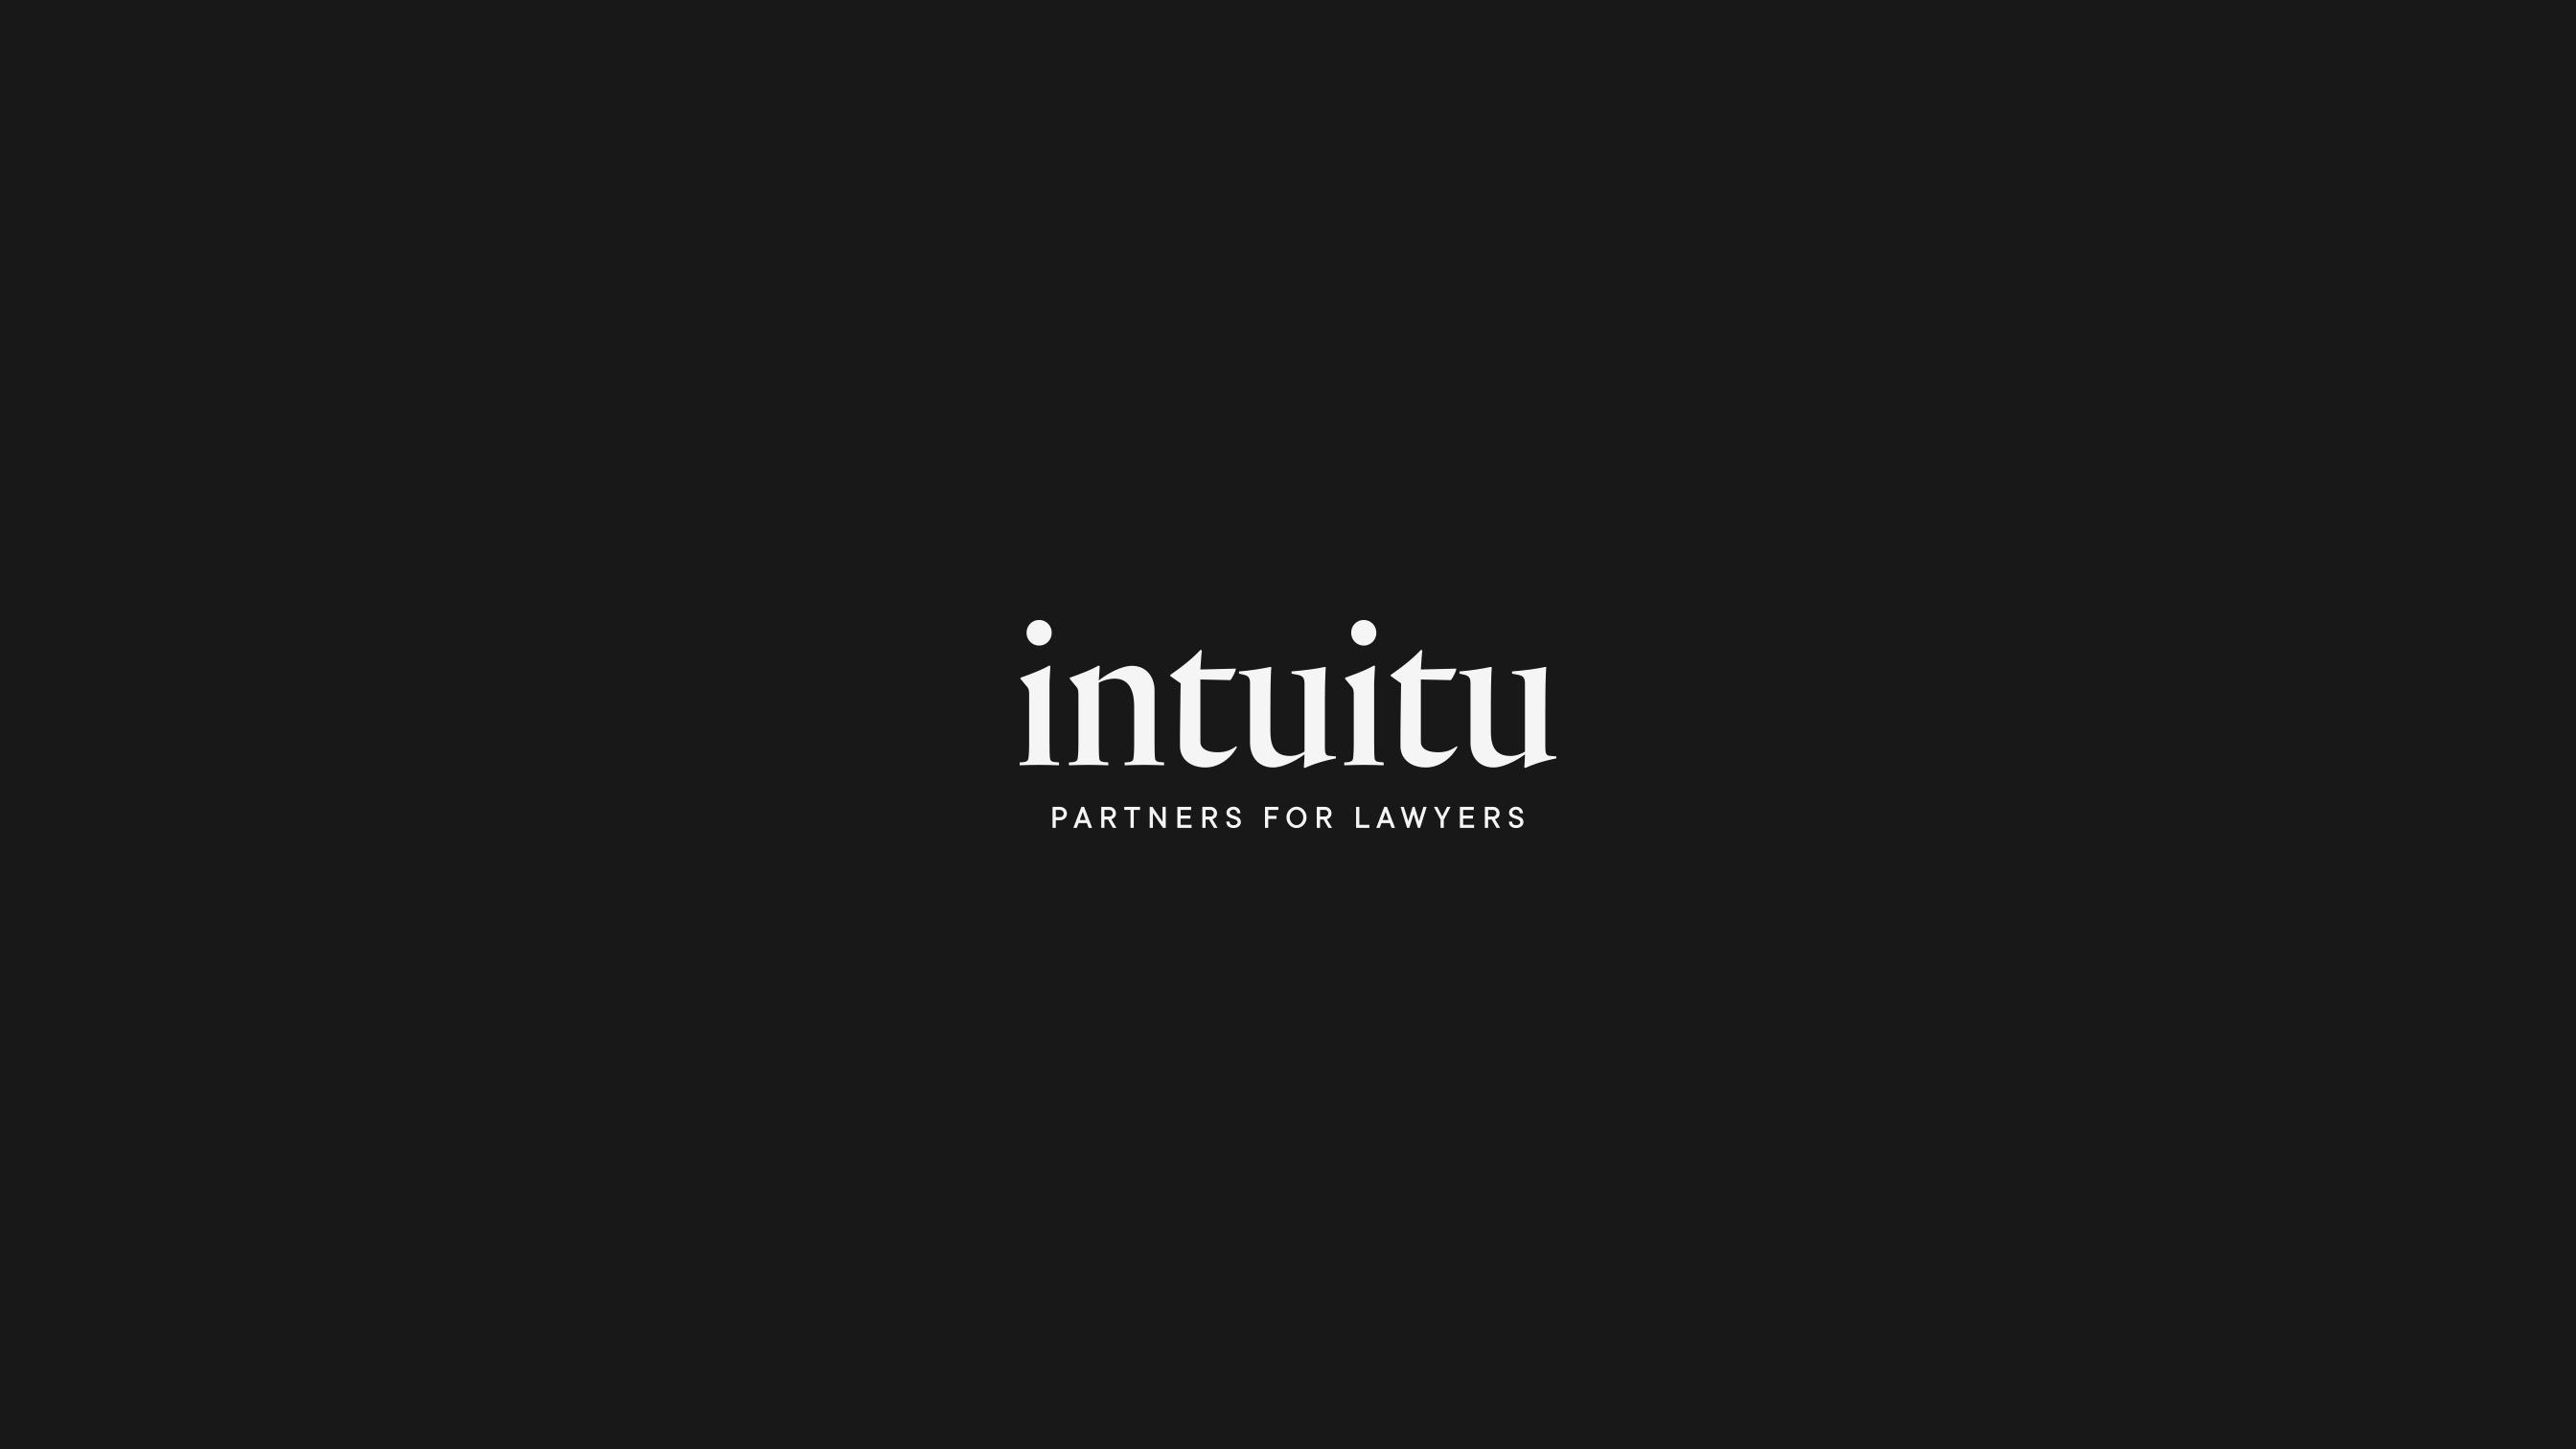 showcase-logo-intuitu